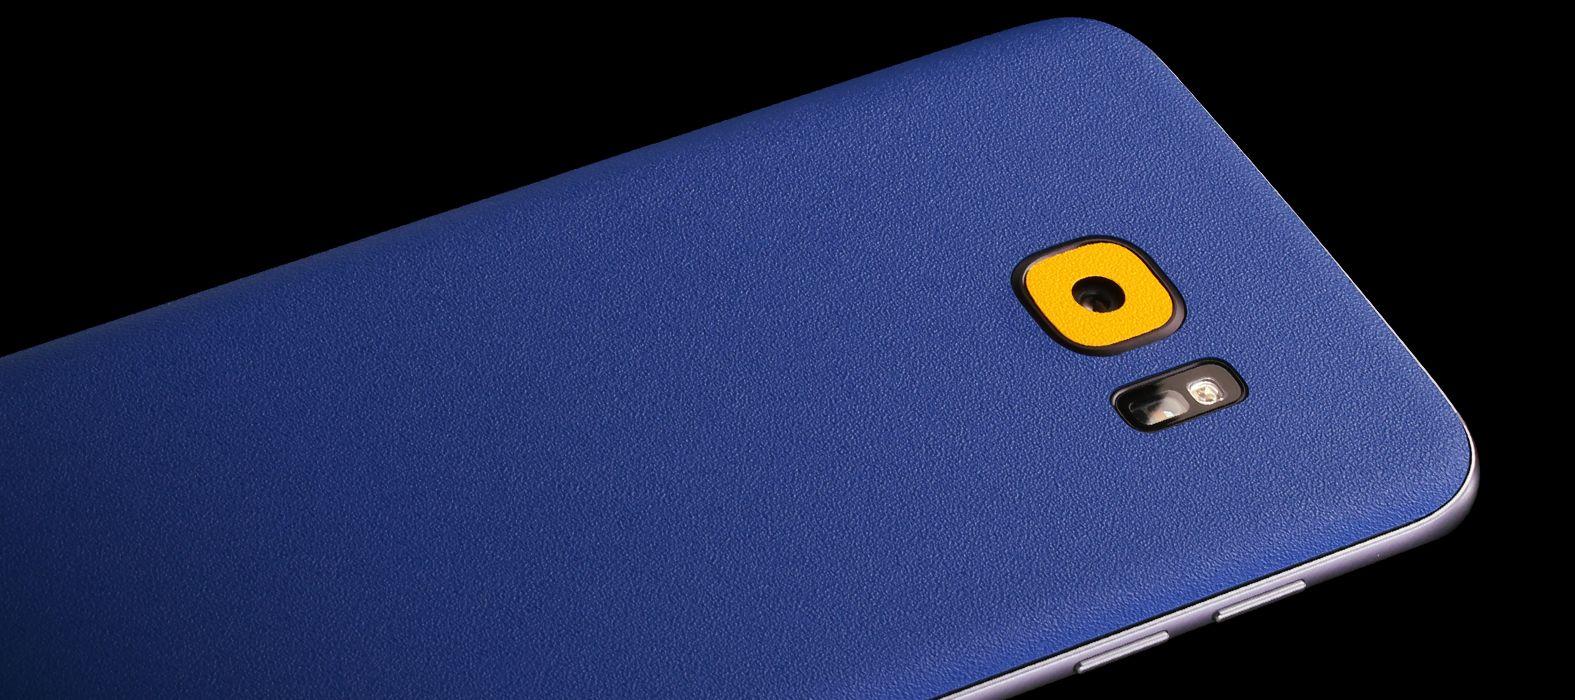 Galaxy S7 Edge Skins